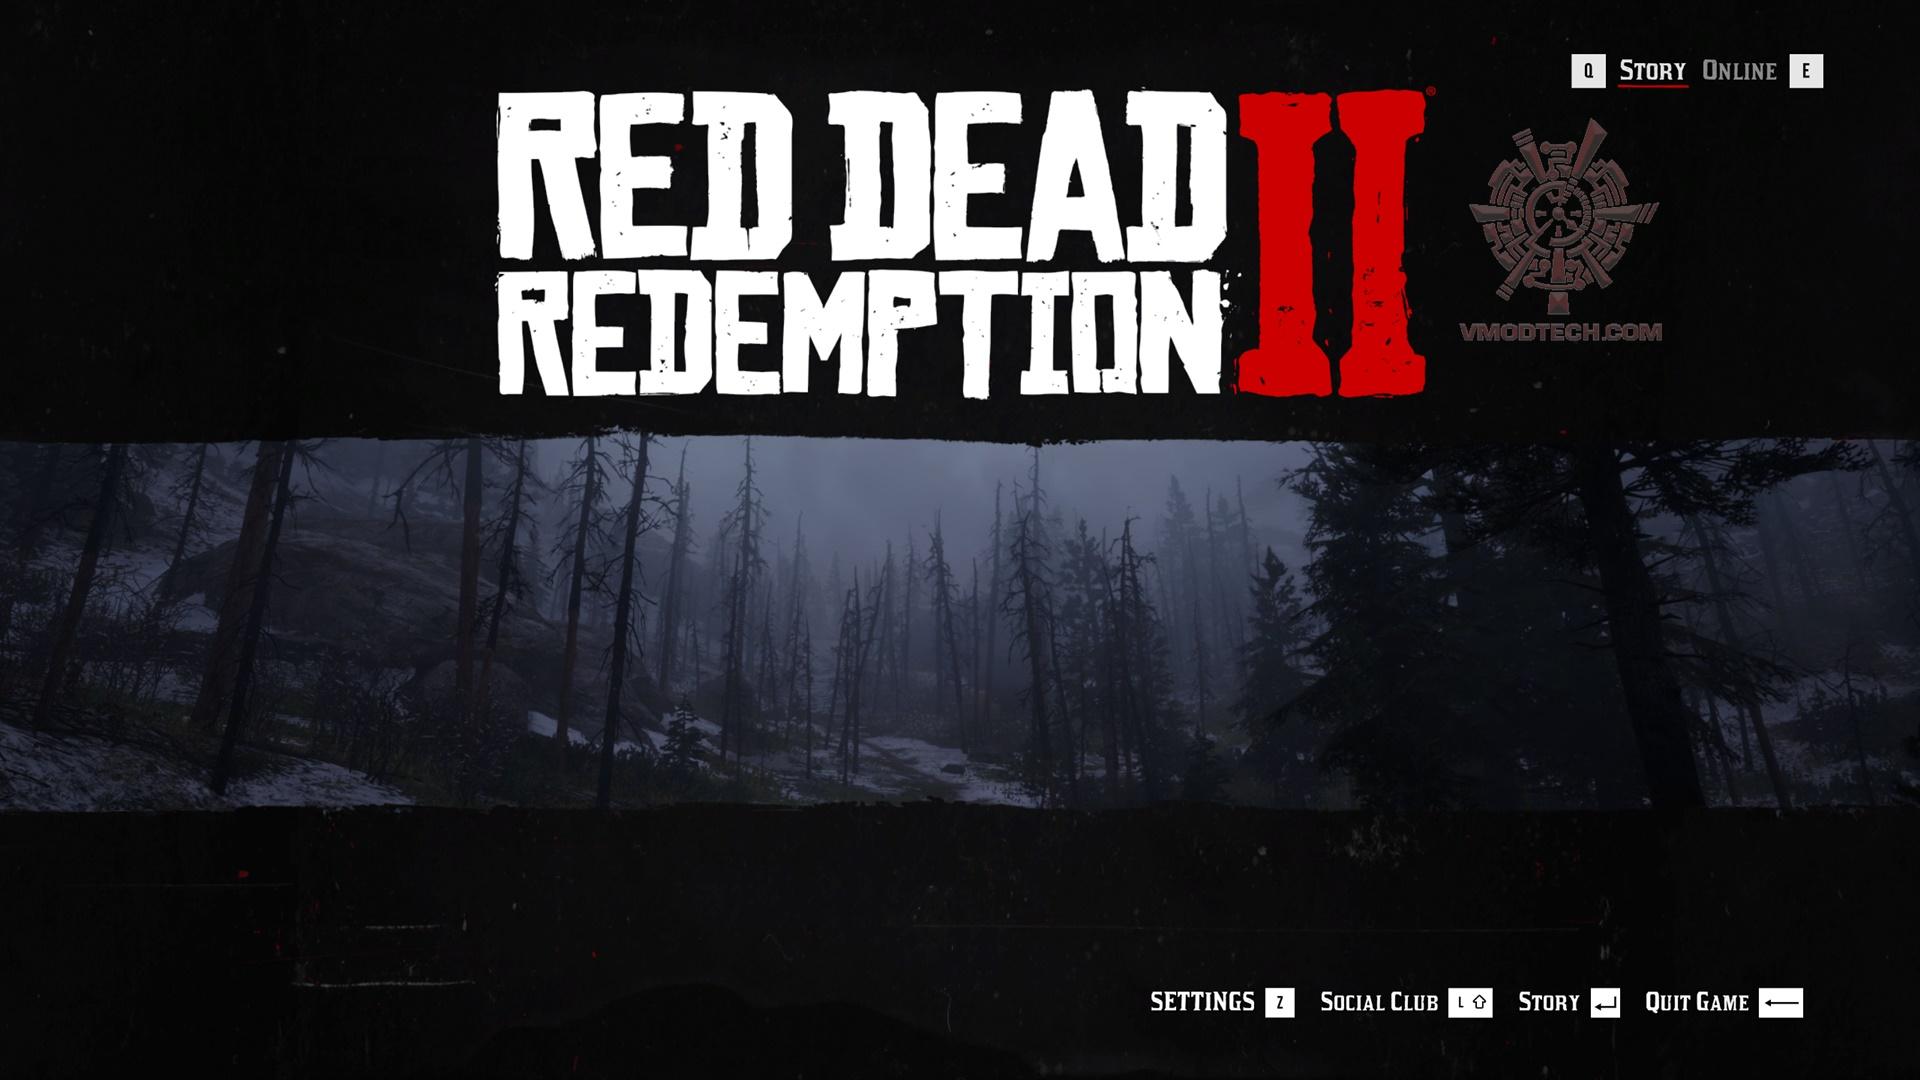 red dead redemption ii screenshot 20191107 22345645 AMD Radeon RX 6700 XT 12GB GDDR6 Review